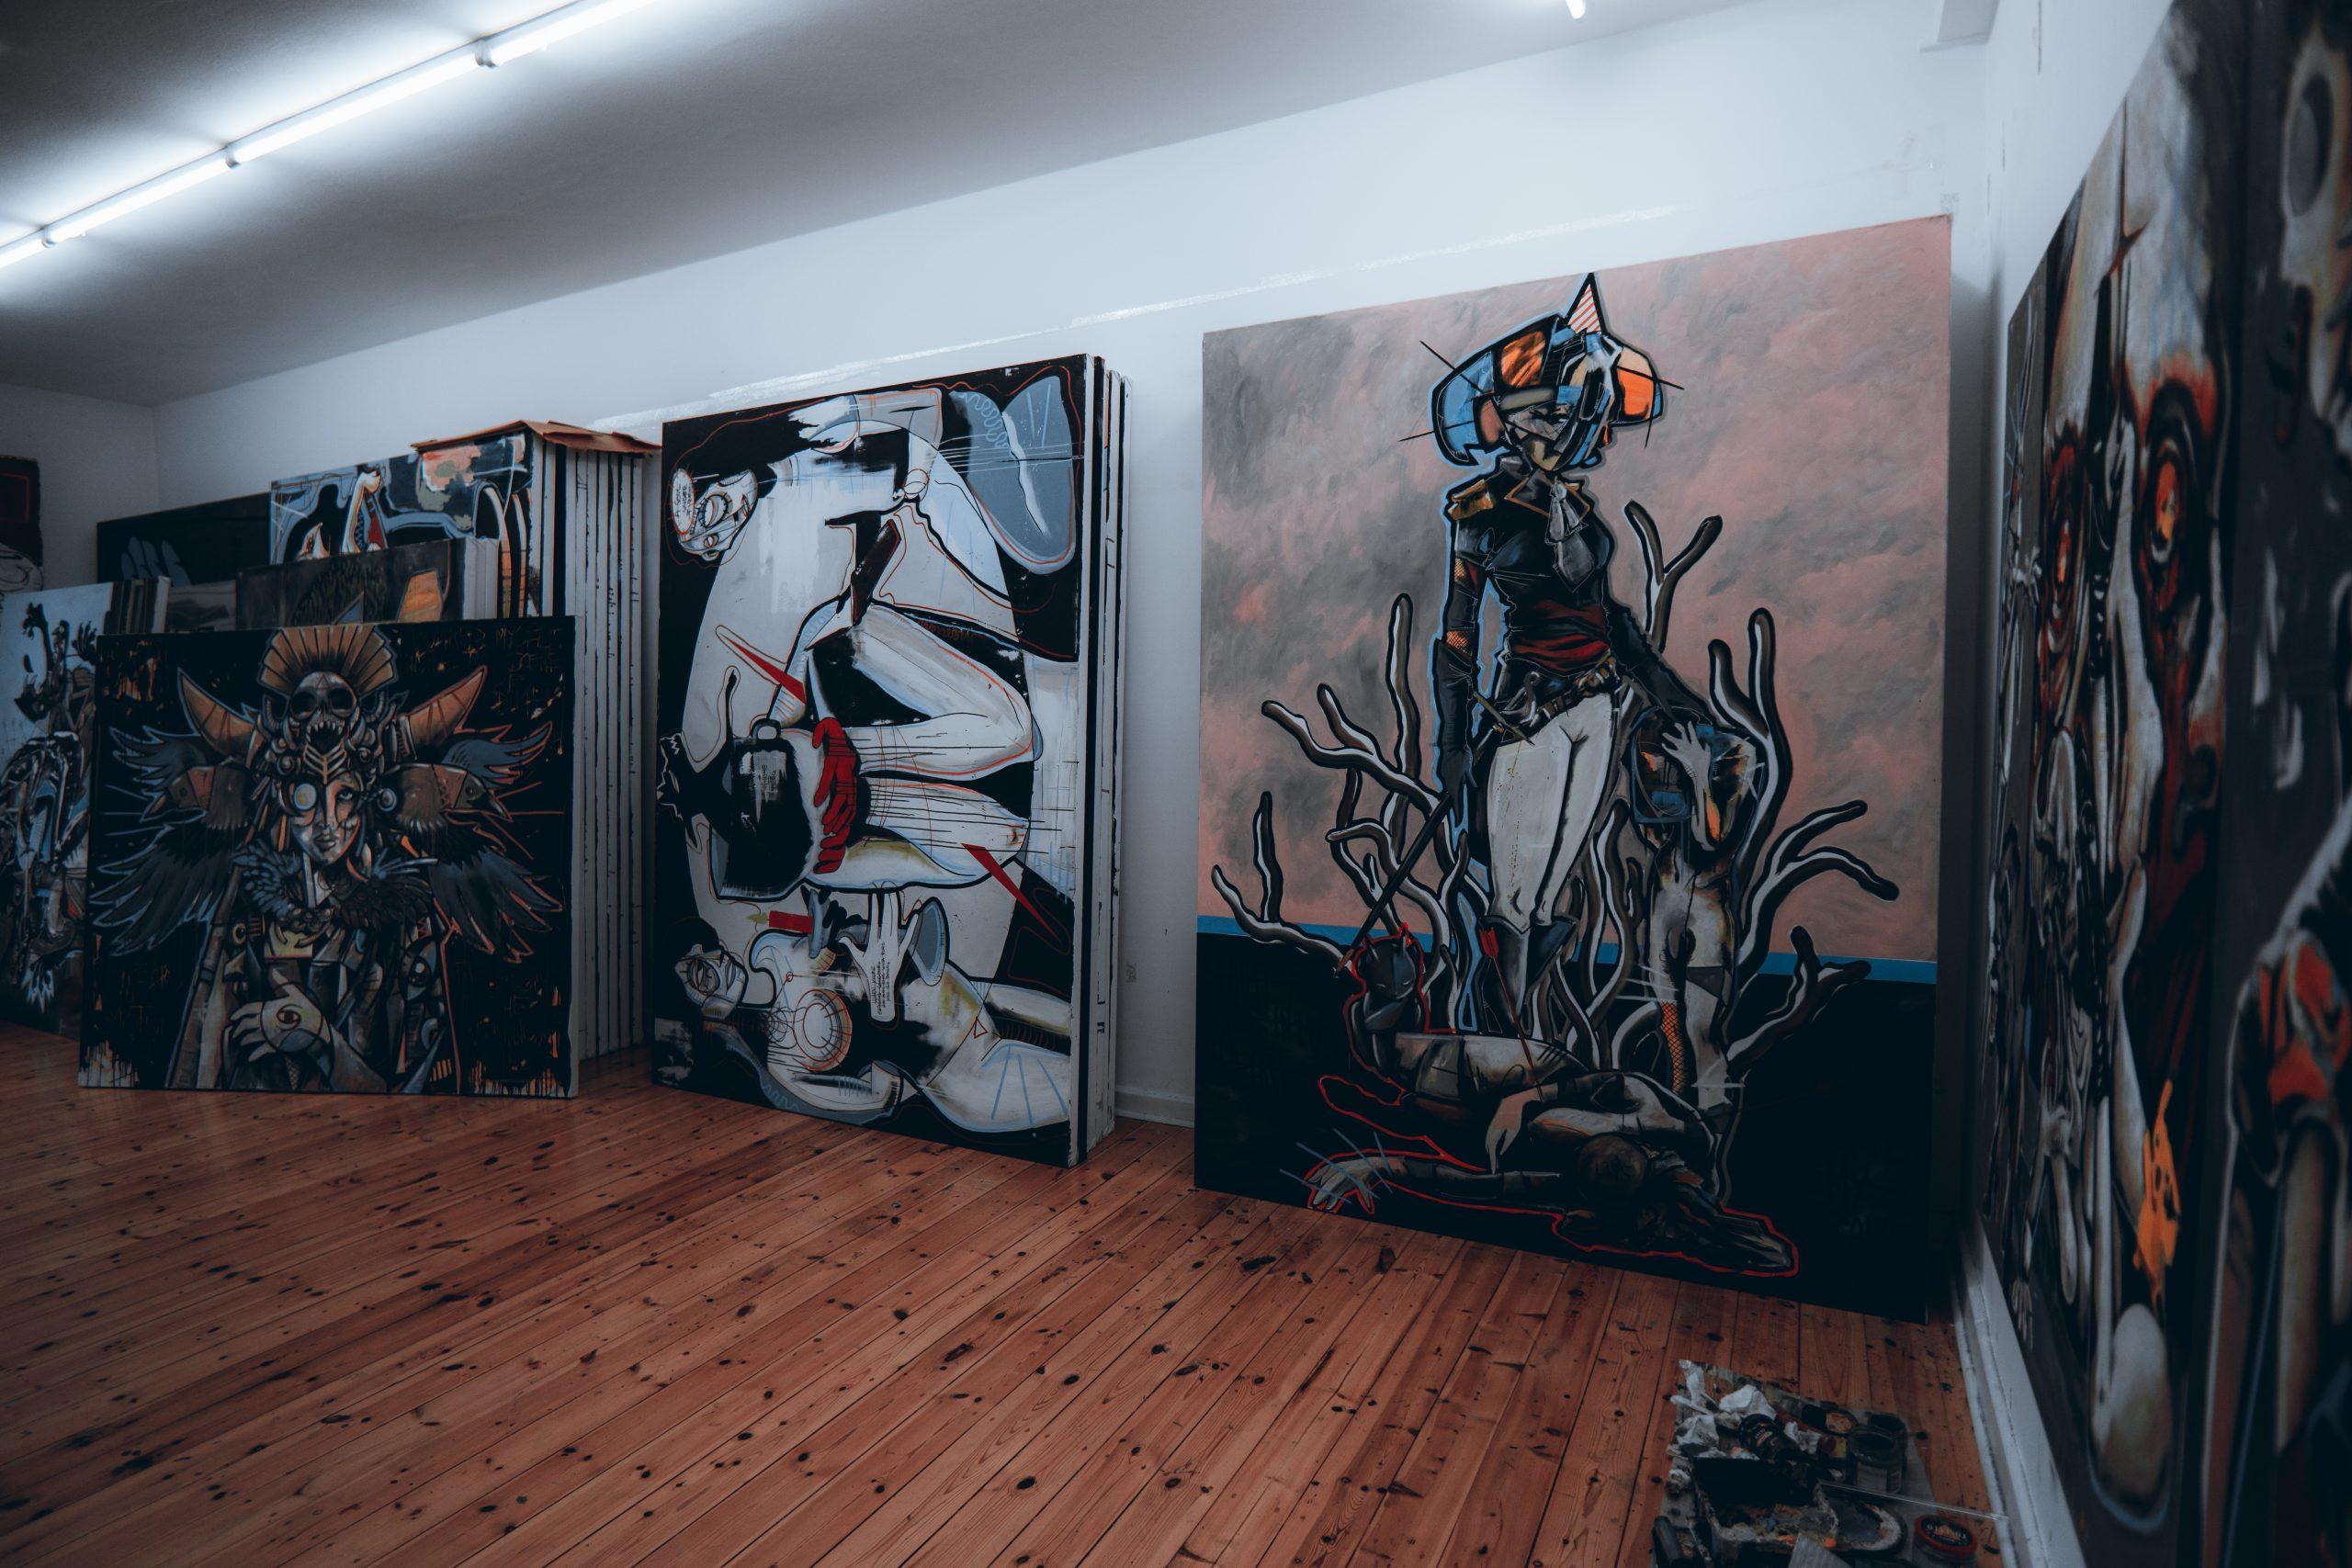 DANIEL HARMS | BRESHIT (2021) UNDER FIRE (2015) MY HEART (2019)